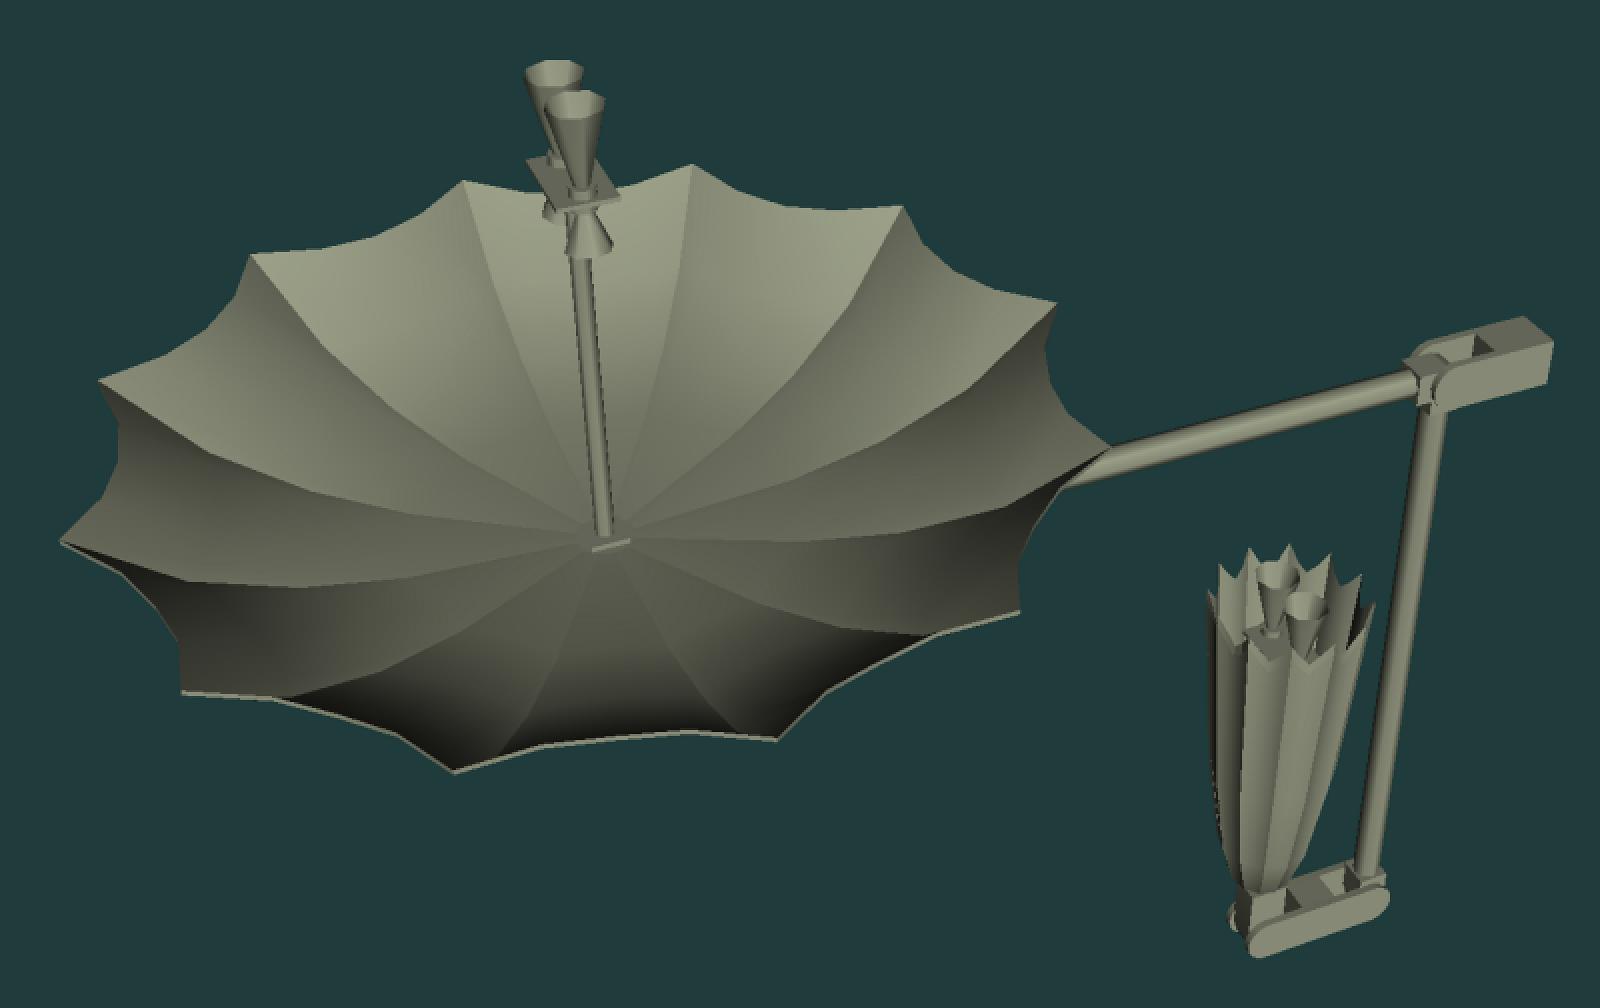 Regenschirm,medium_large.2x.1536330617.PNG